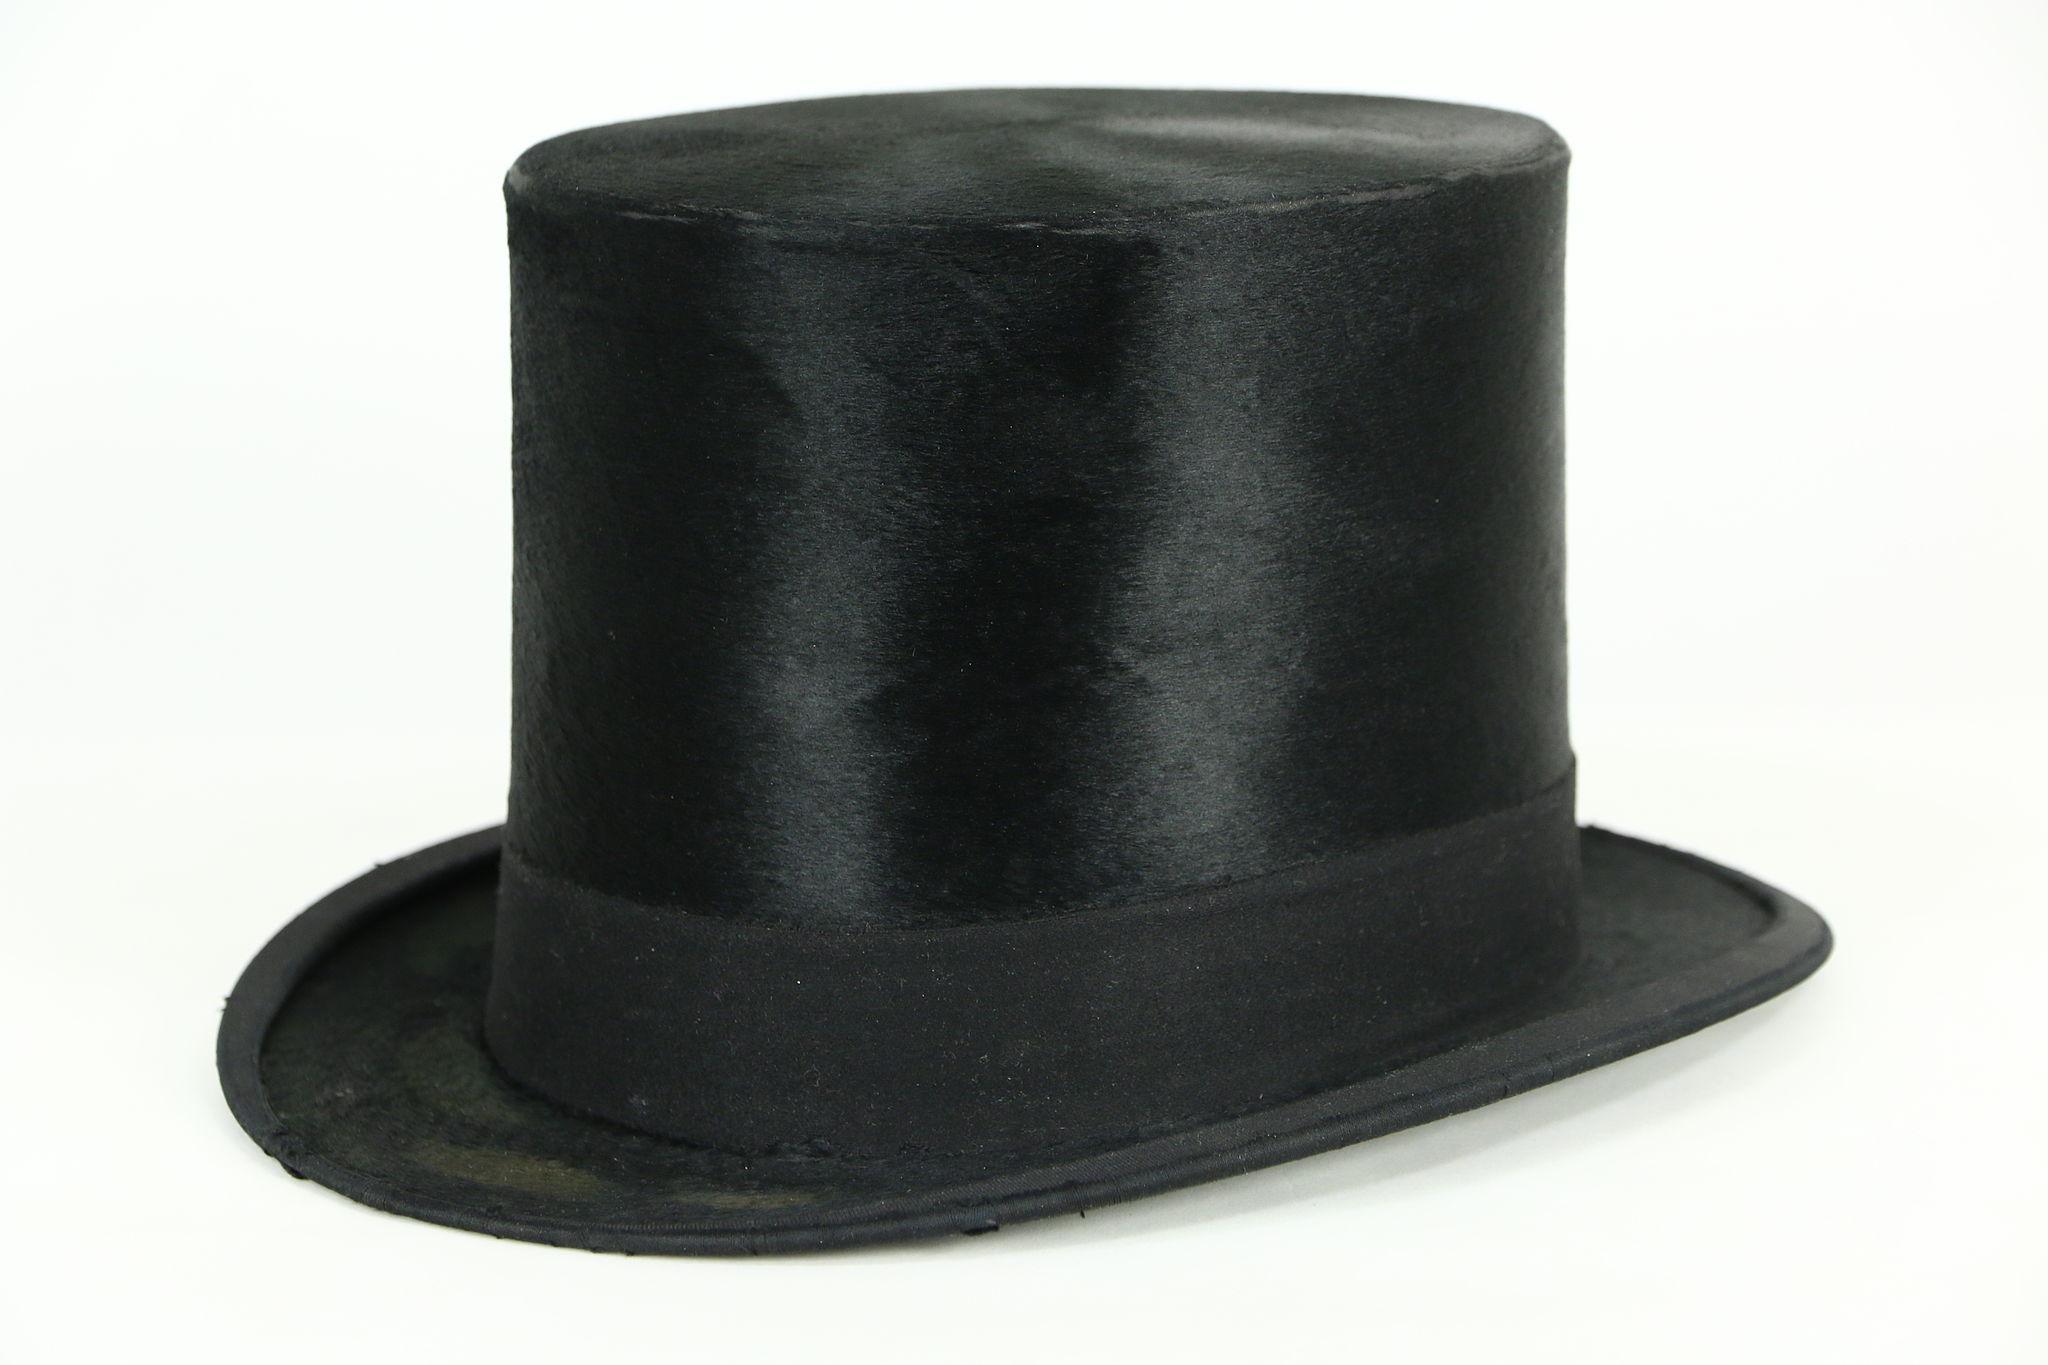 SOLD - Beaver Silk Antique late 1800 s Antique Top Hat bf432c2eec0